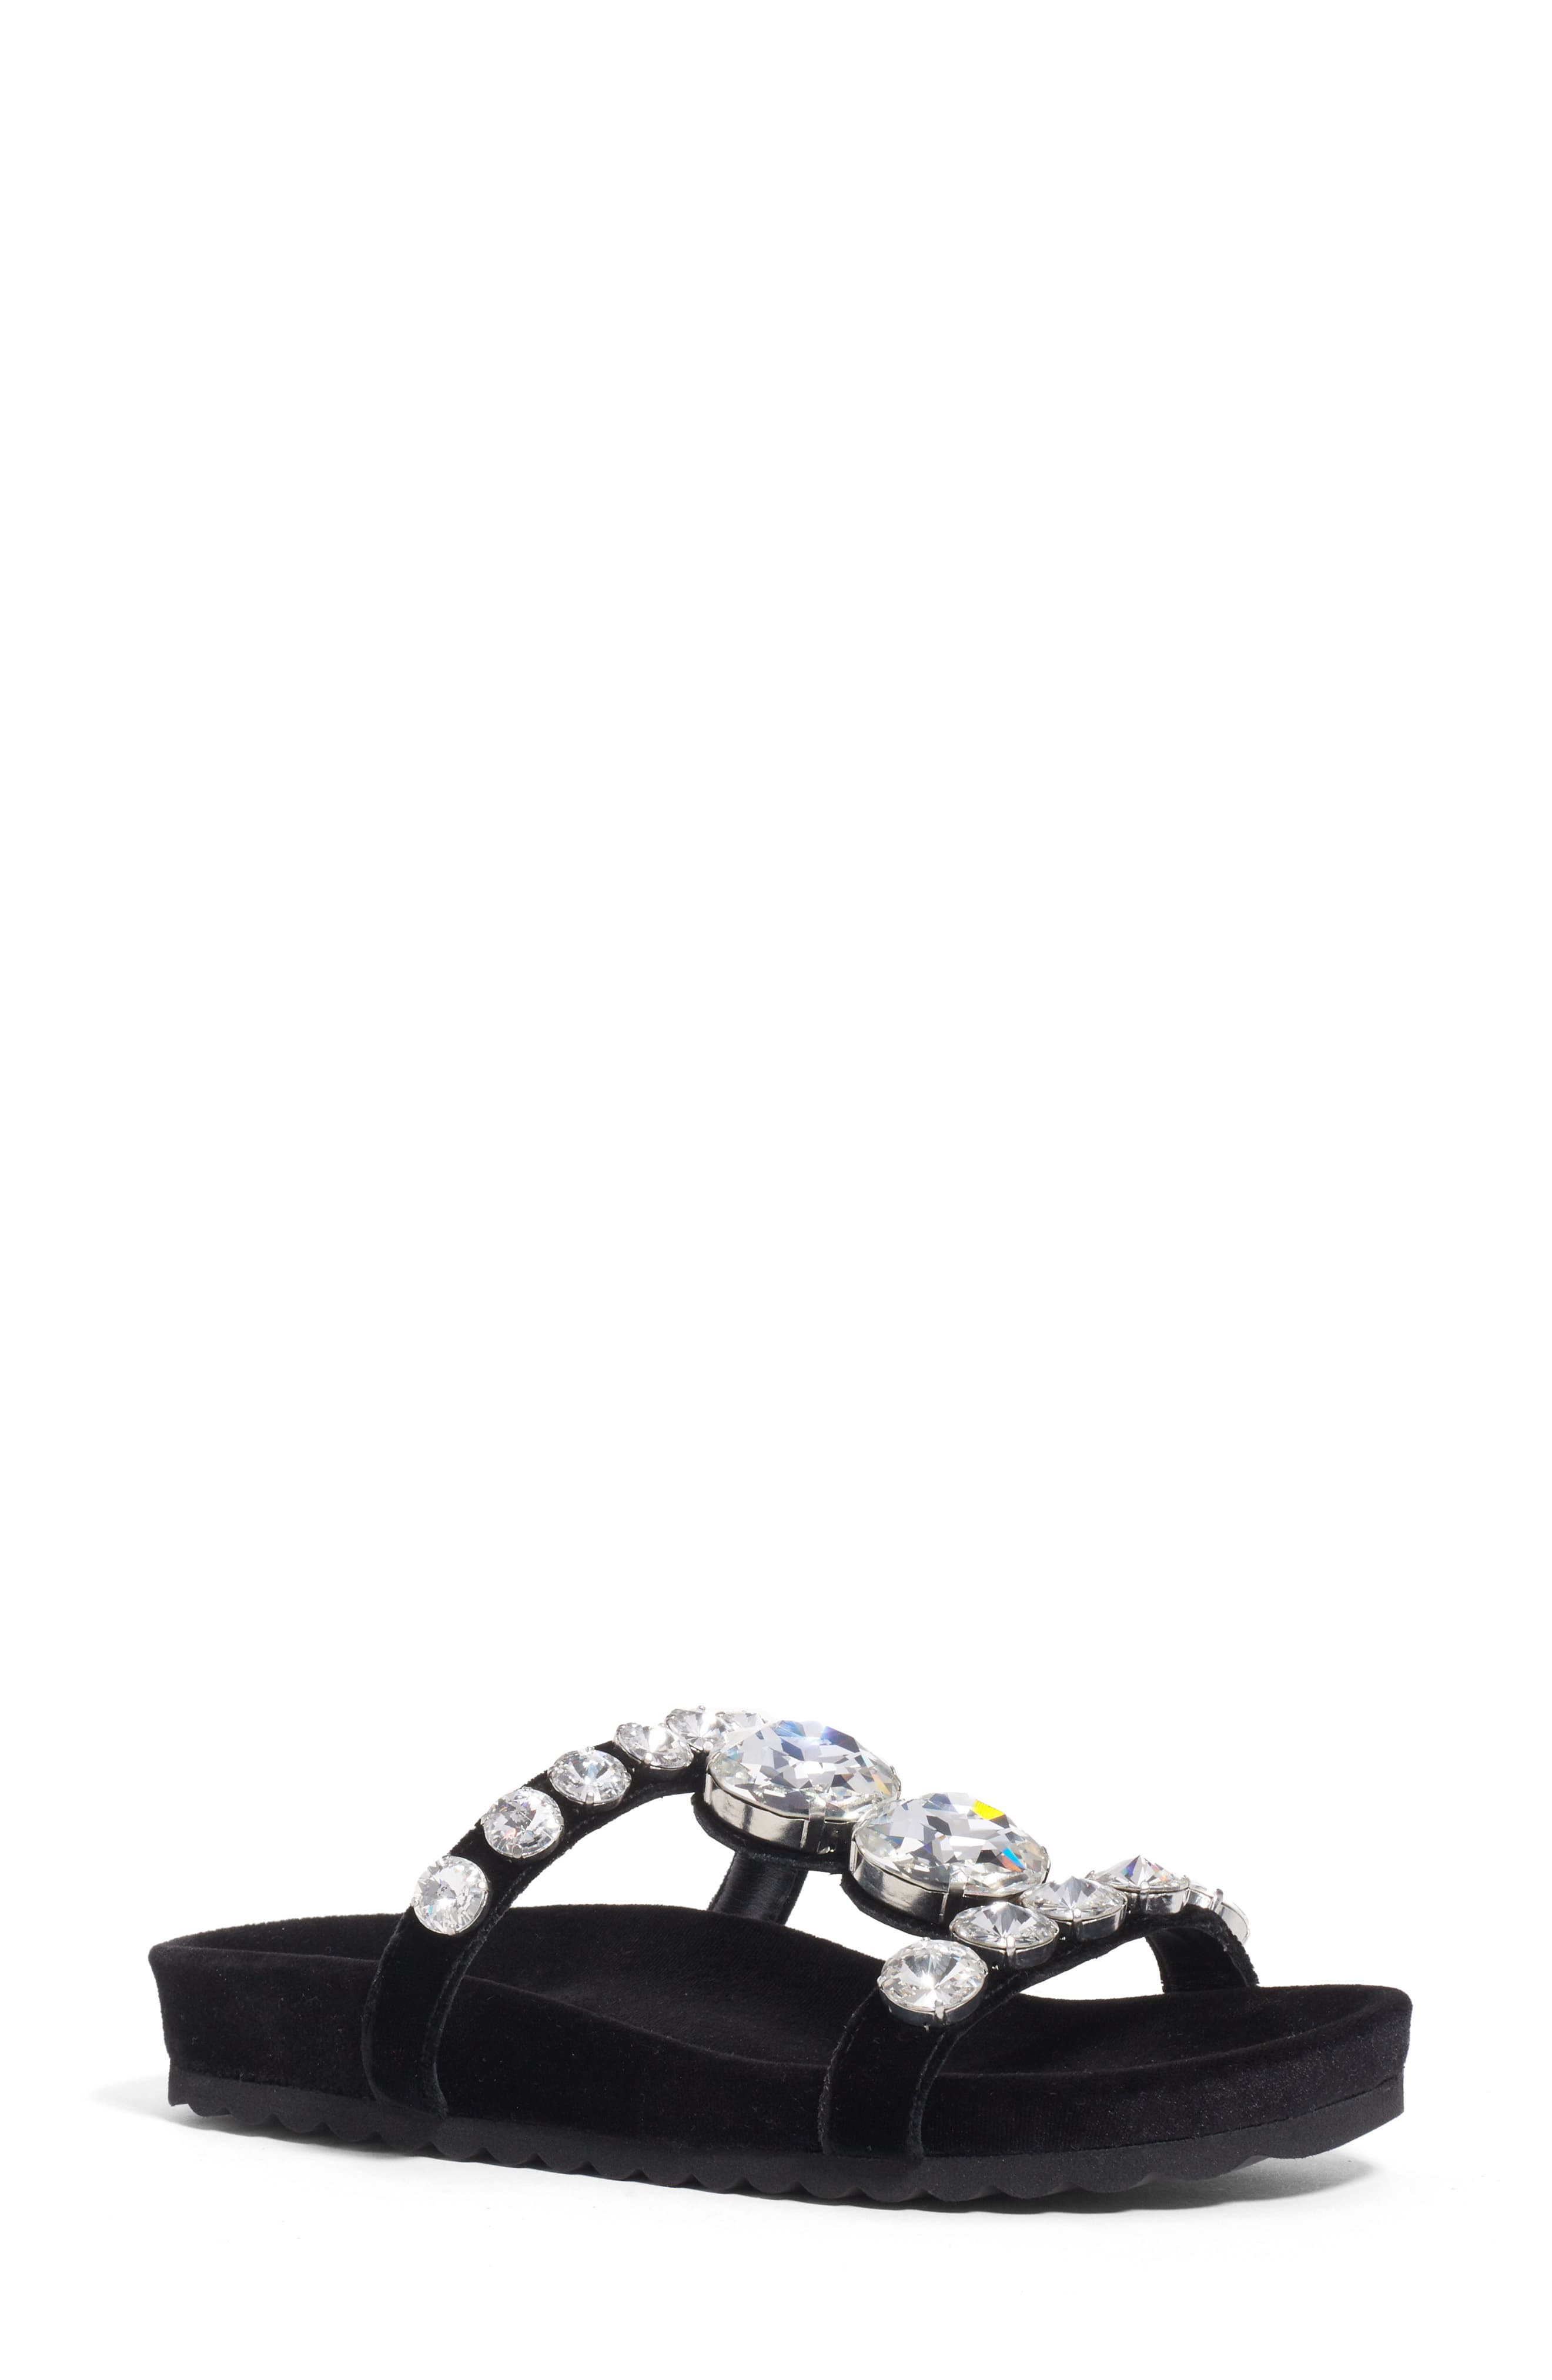 327b1d0960 Women's Miu Miu Crystal Embellished Slide Sandal, Size 8US / 38EU - Black